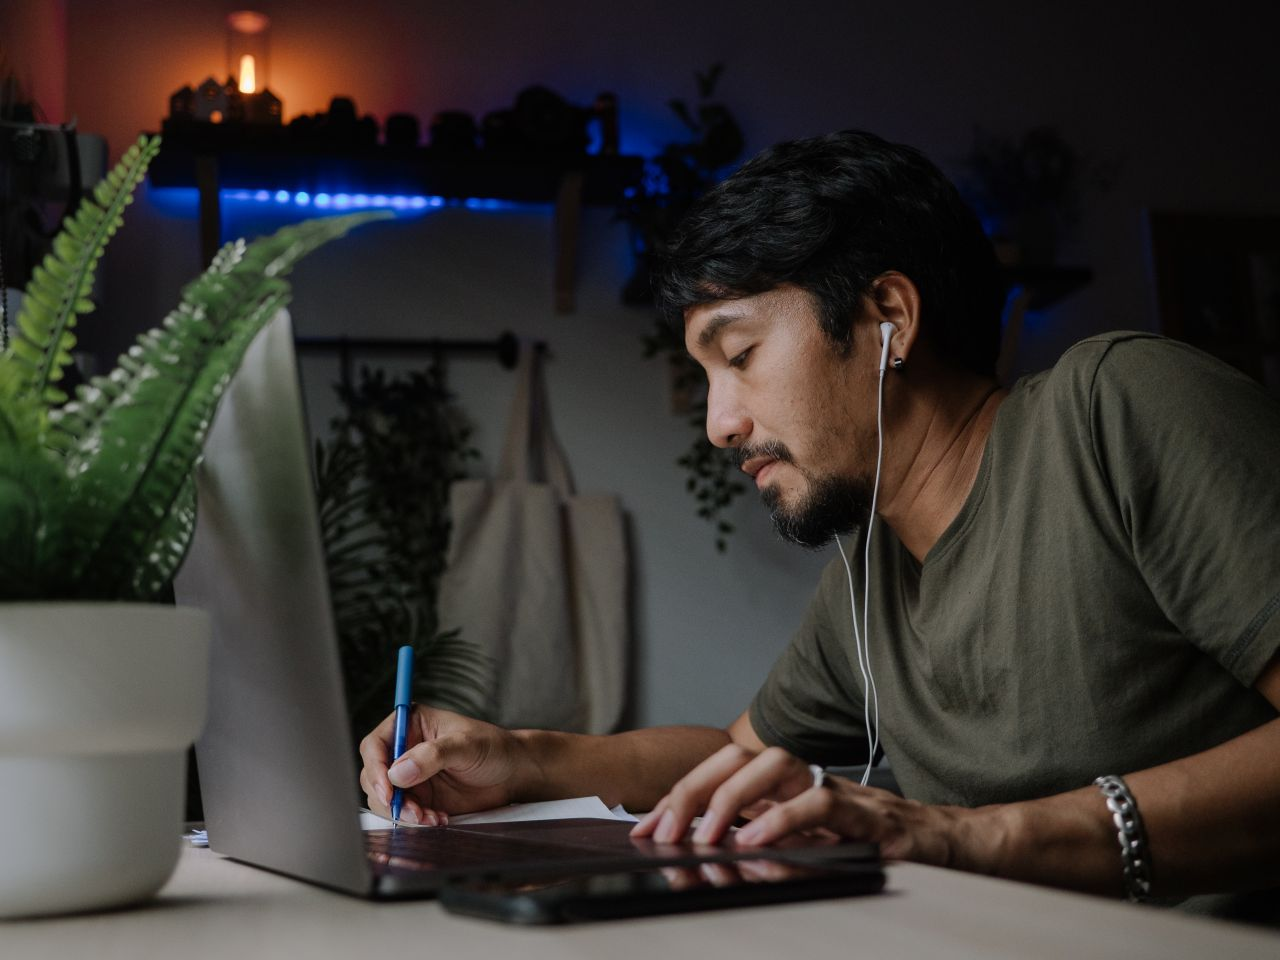 Mann am Laptop macht Notizen